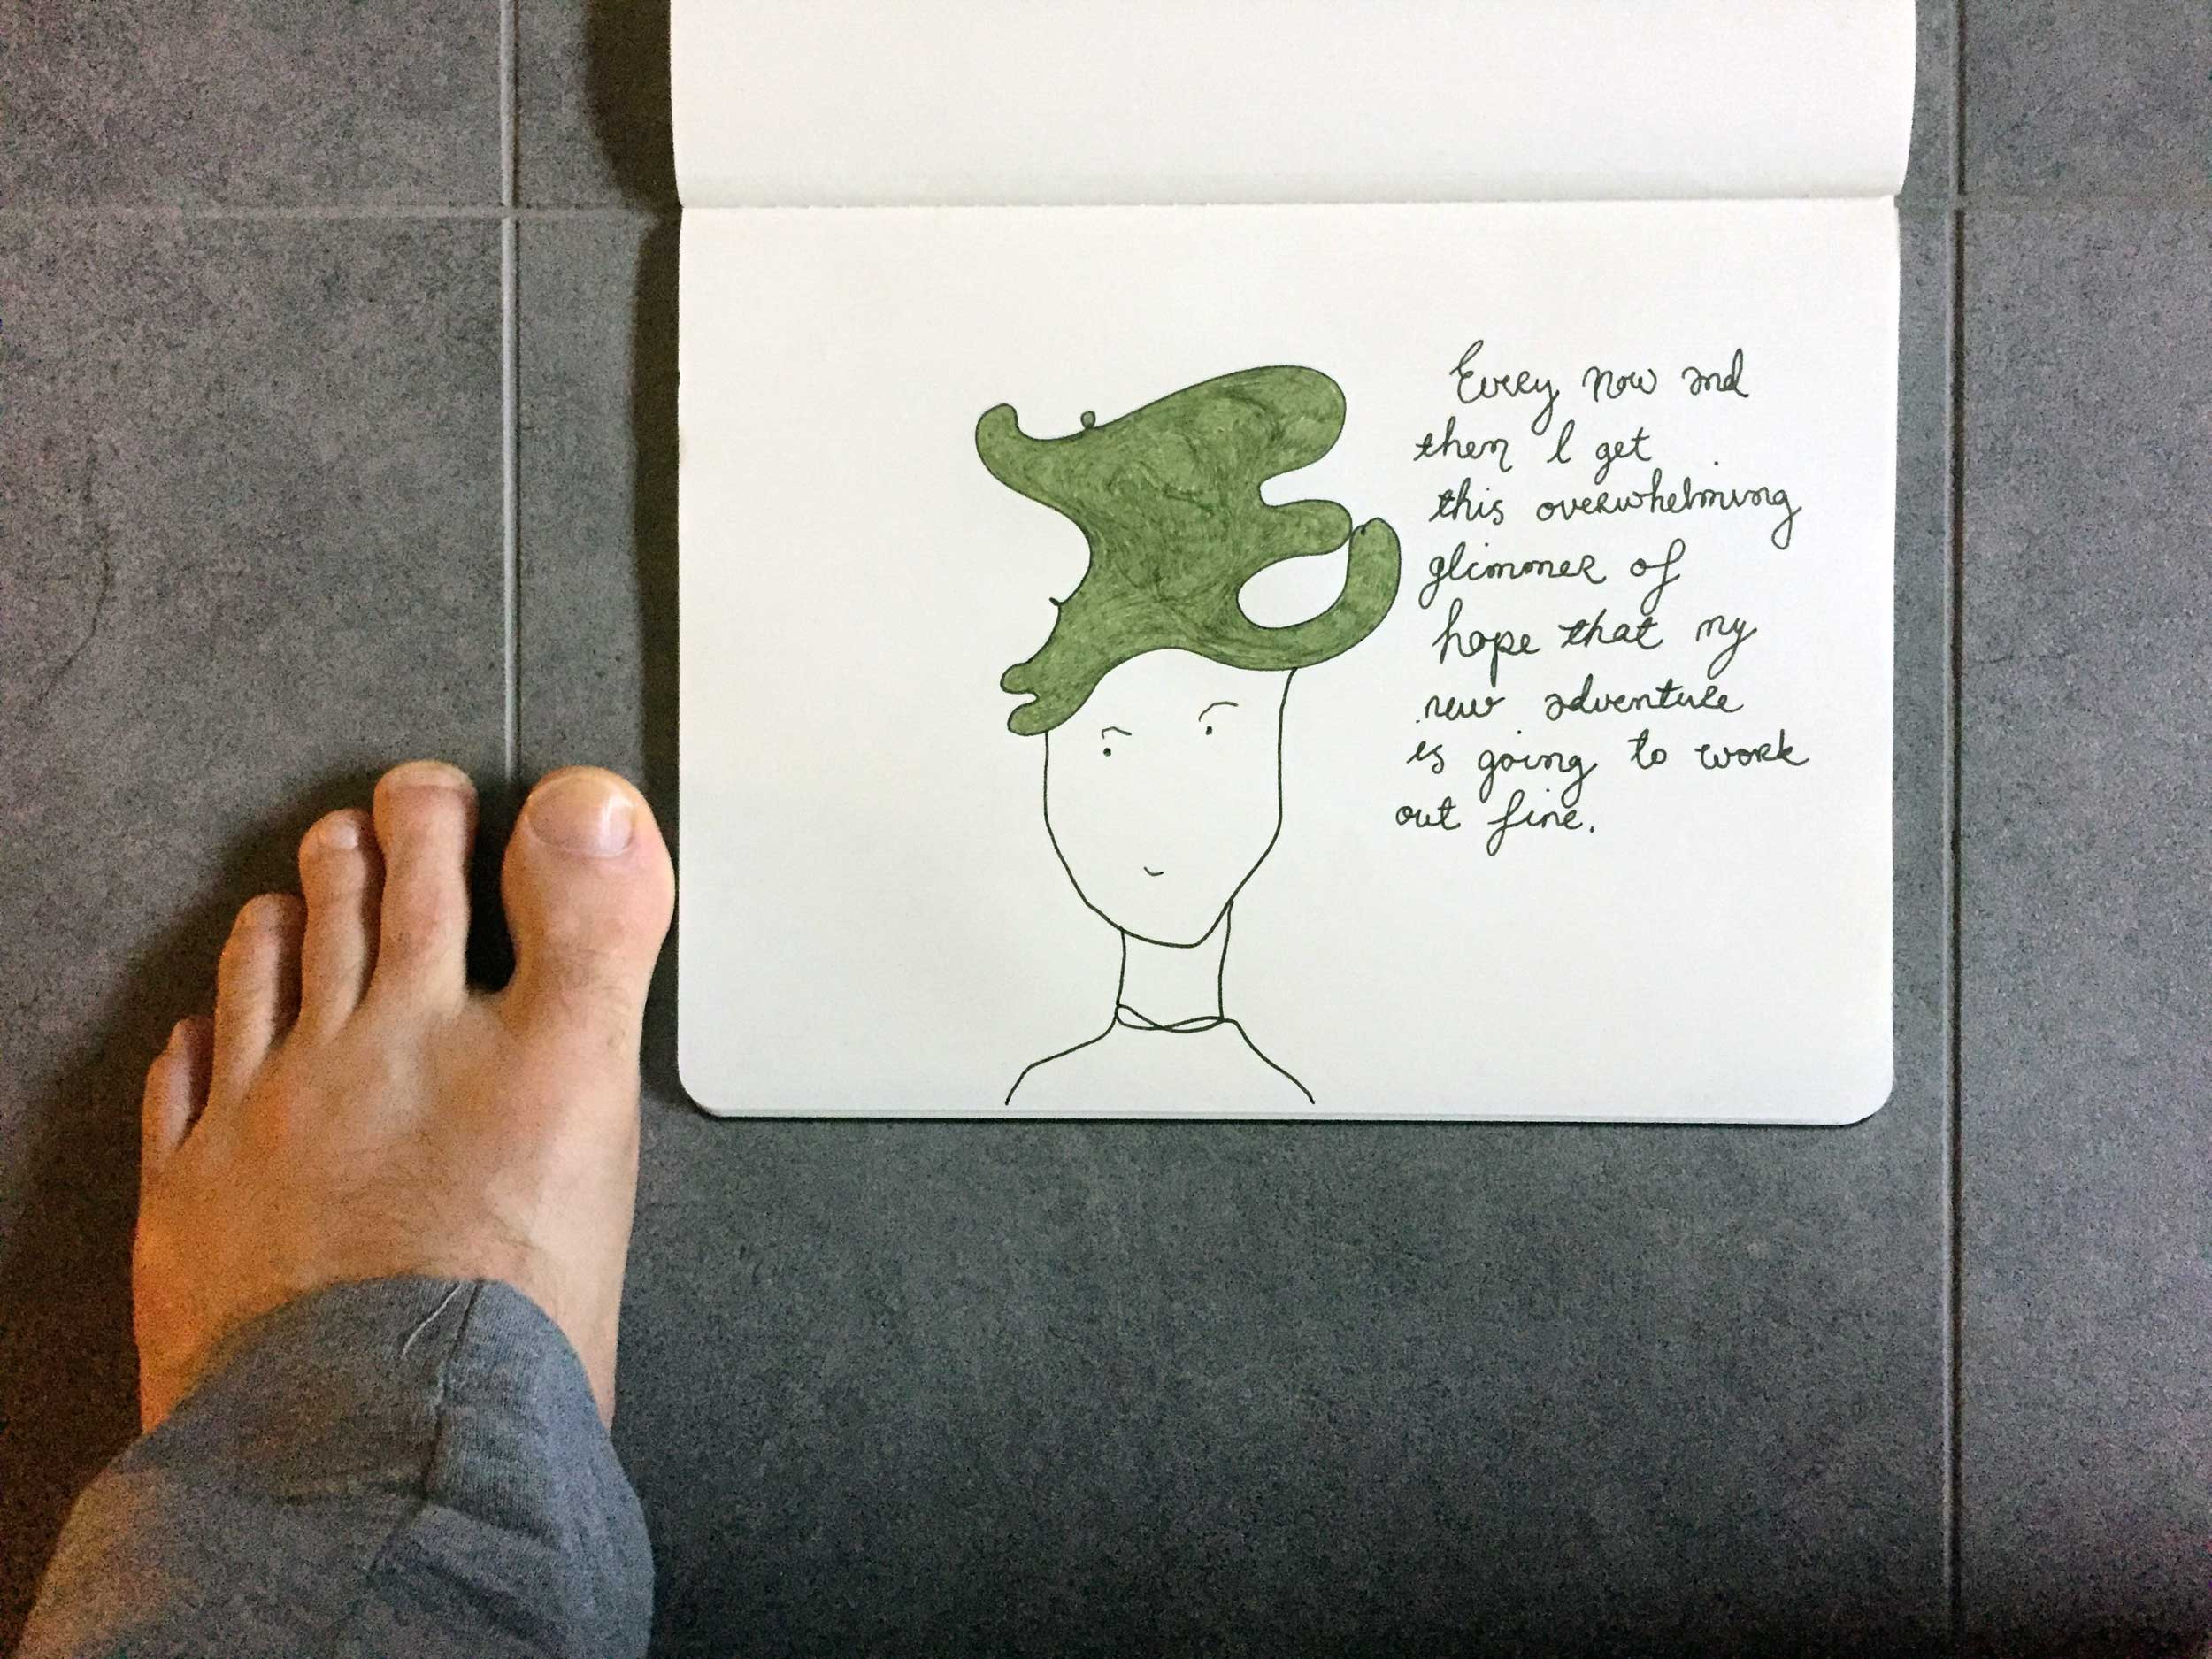 A glimmer of hope. Drawing Luke Hockley.